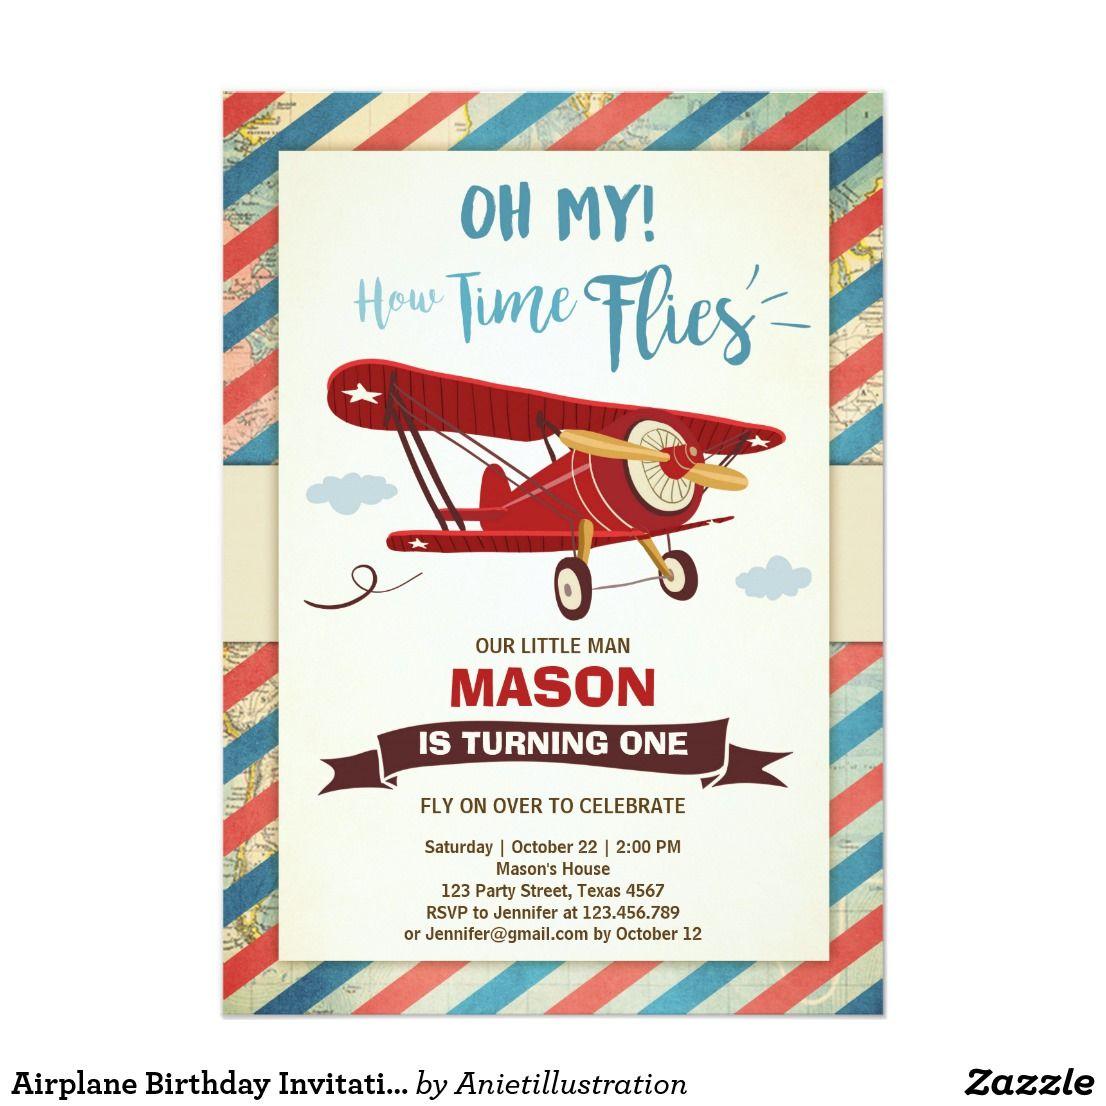 Airplane Birthday Invitation Time Flies Plane Boy Zazzle Com Airplane Birthday Party Planes Birthday Airplane Birthday